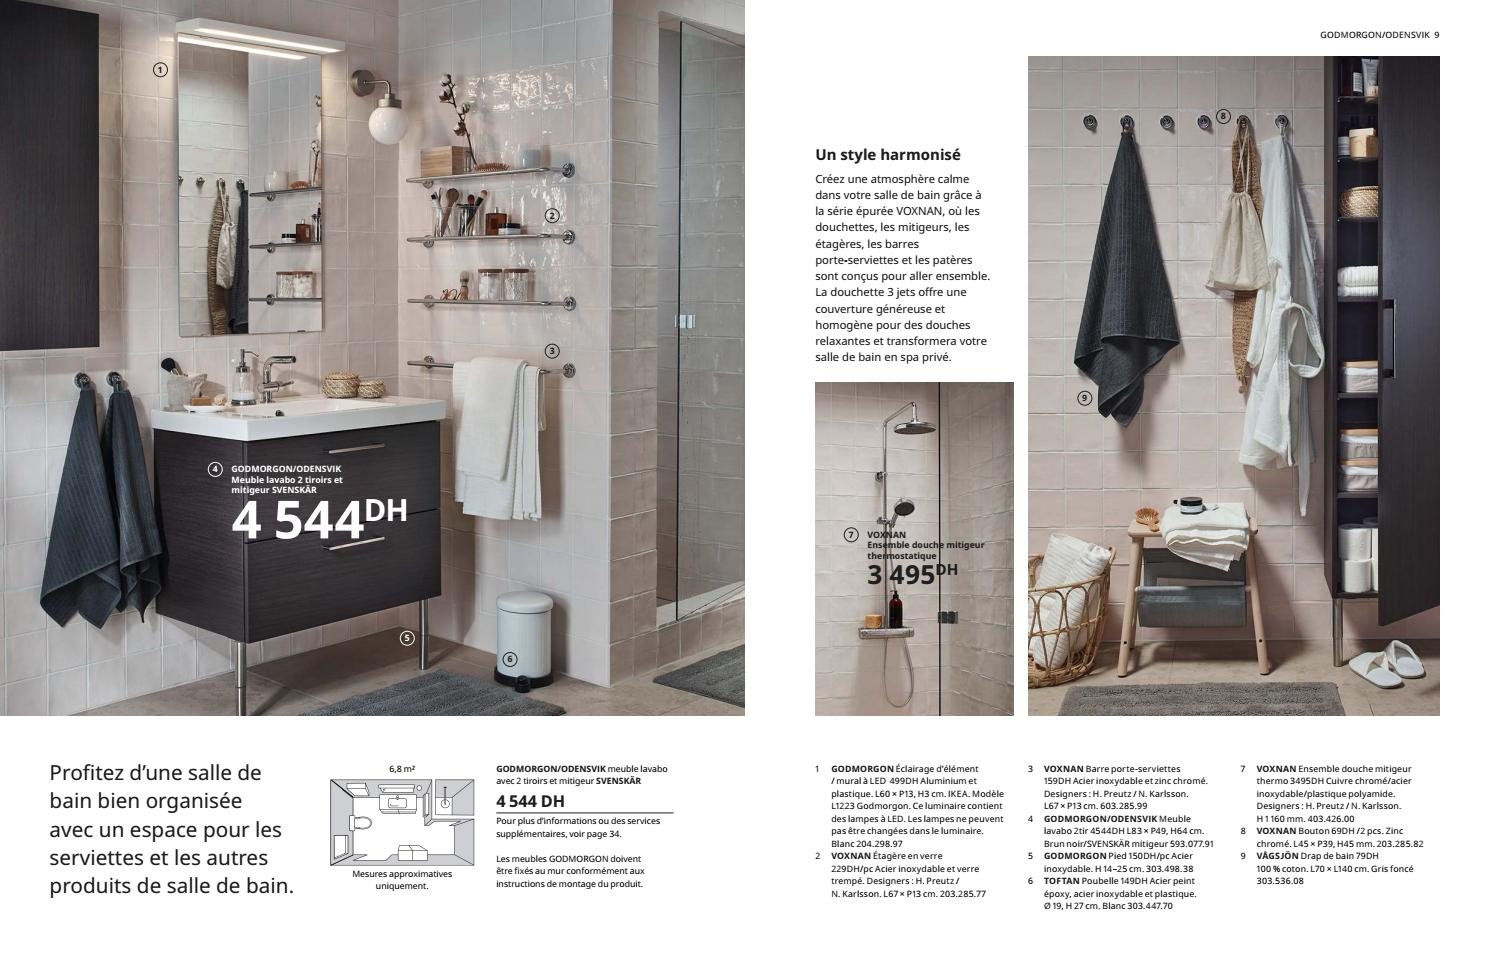 Pied Meuble Salle De Bain Ikea catalogue ikea maroc | salle de bain 2020